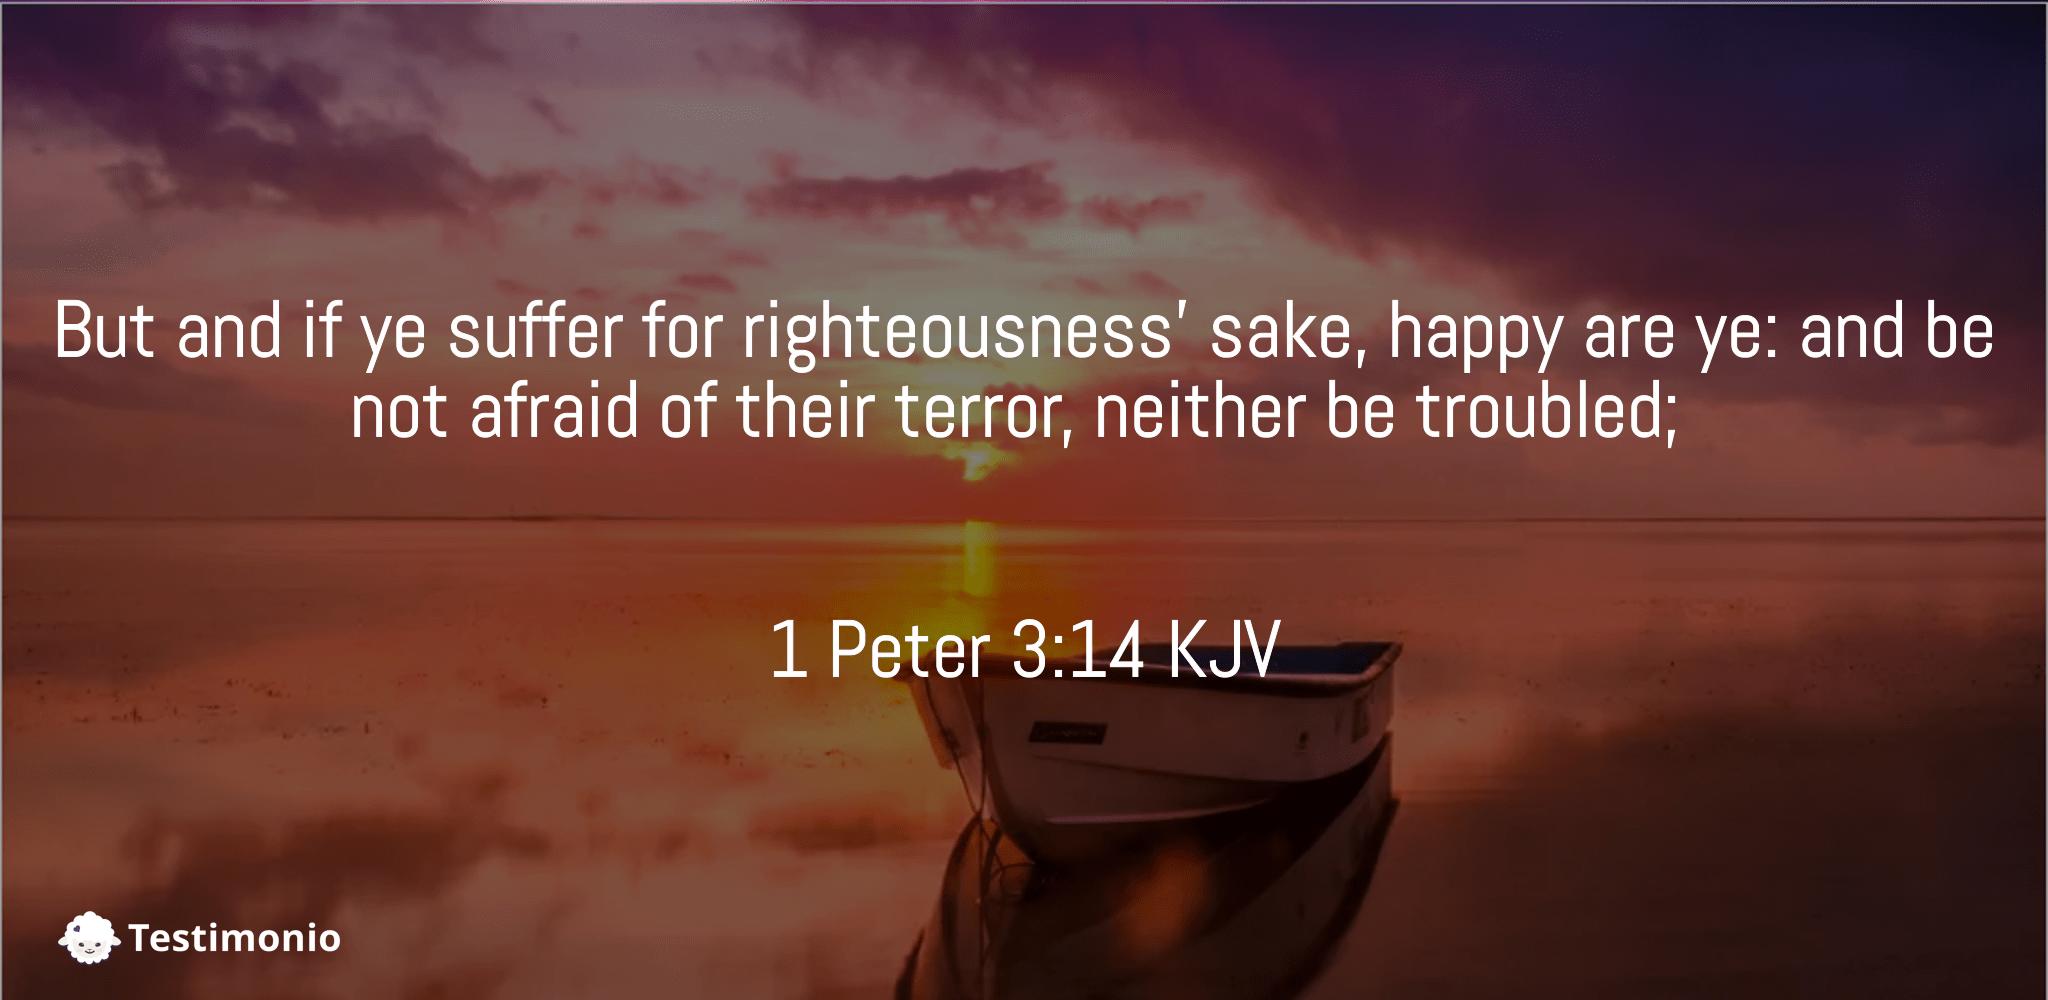 1 Peter 3:14